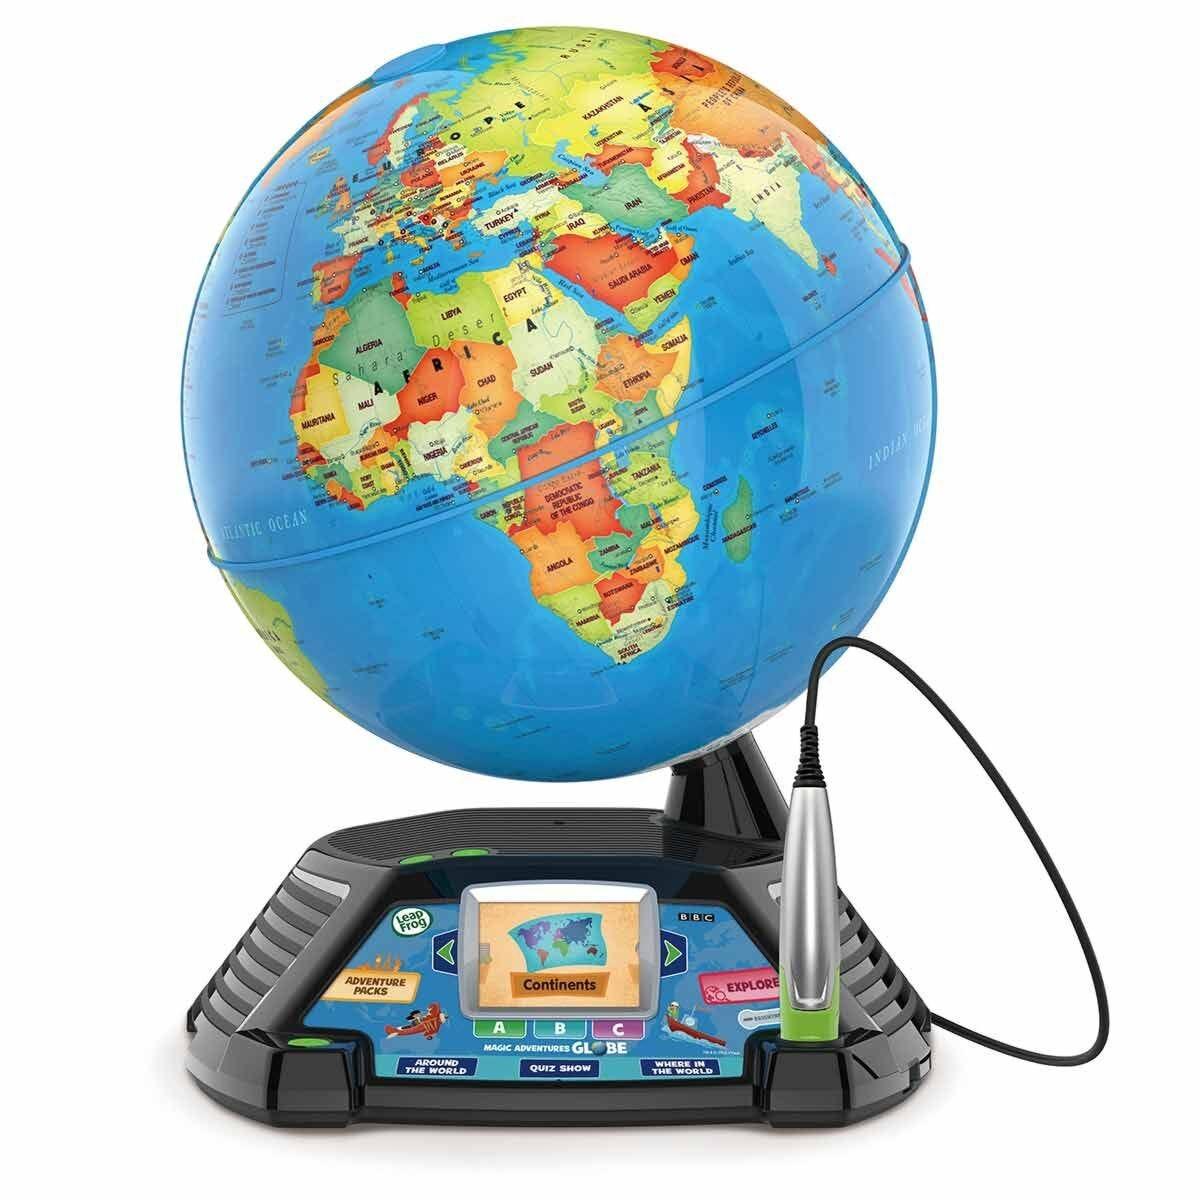 Leapfrog Magic Adventures Smart Globe